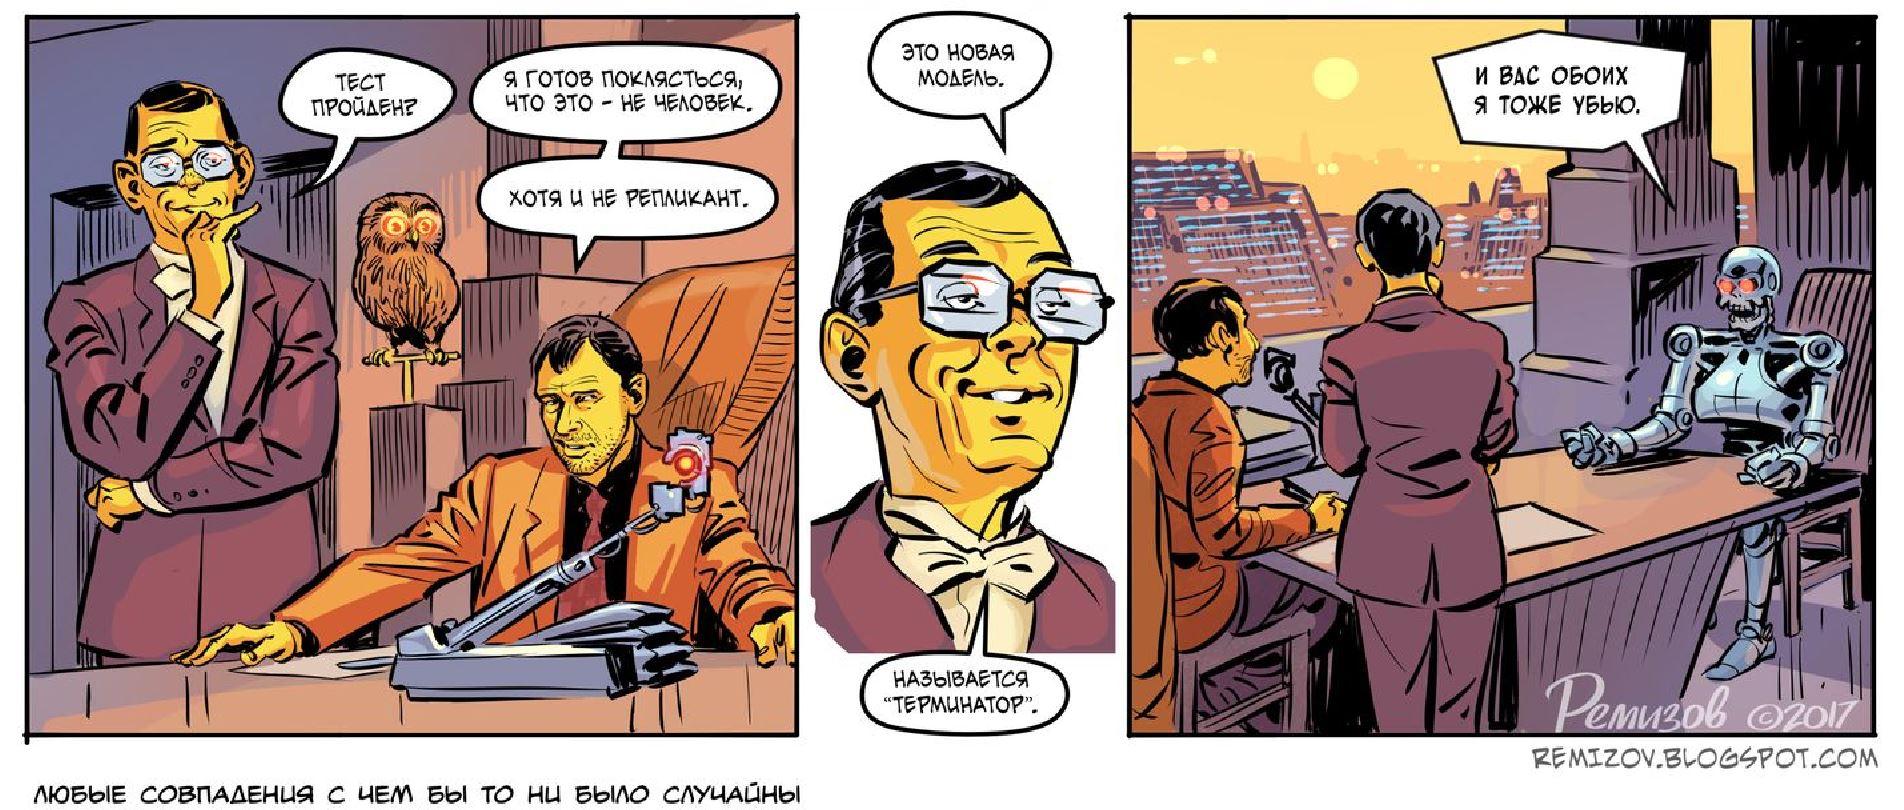 Комикс: тест 3